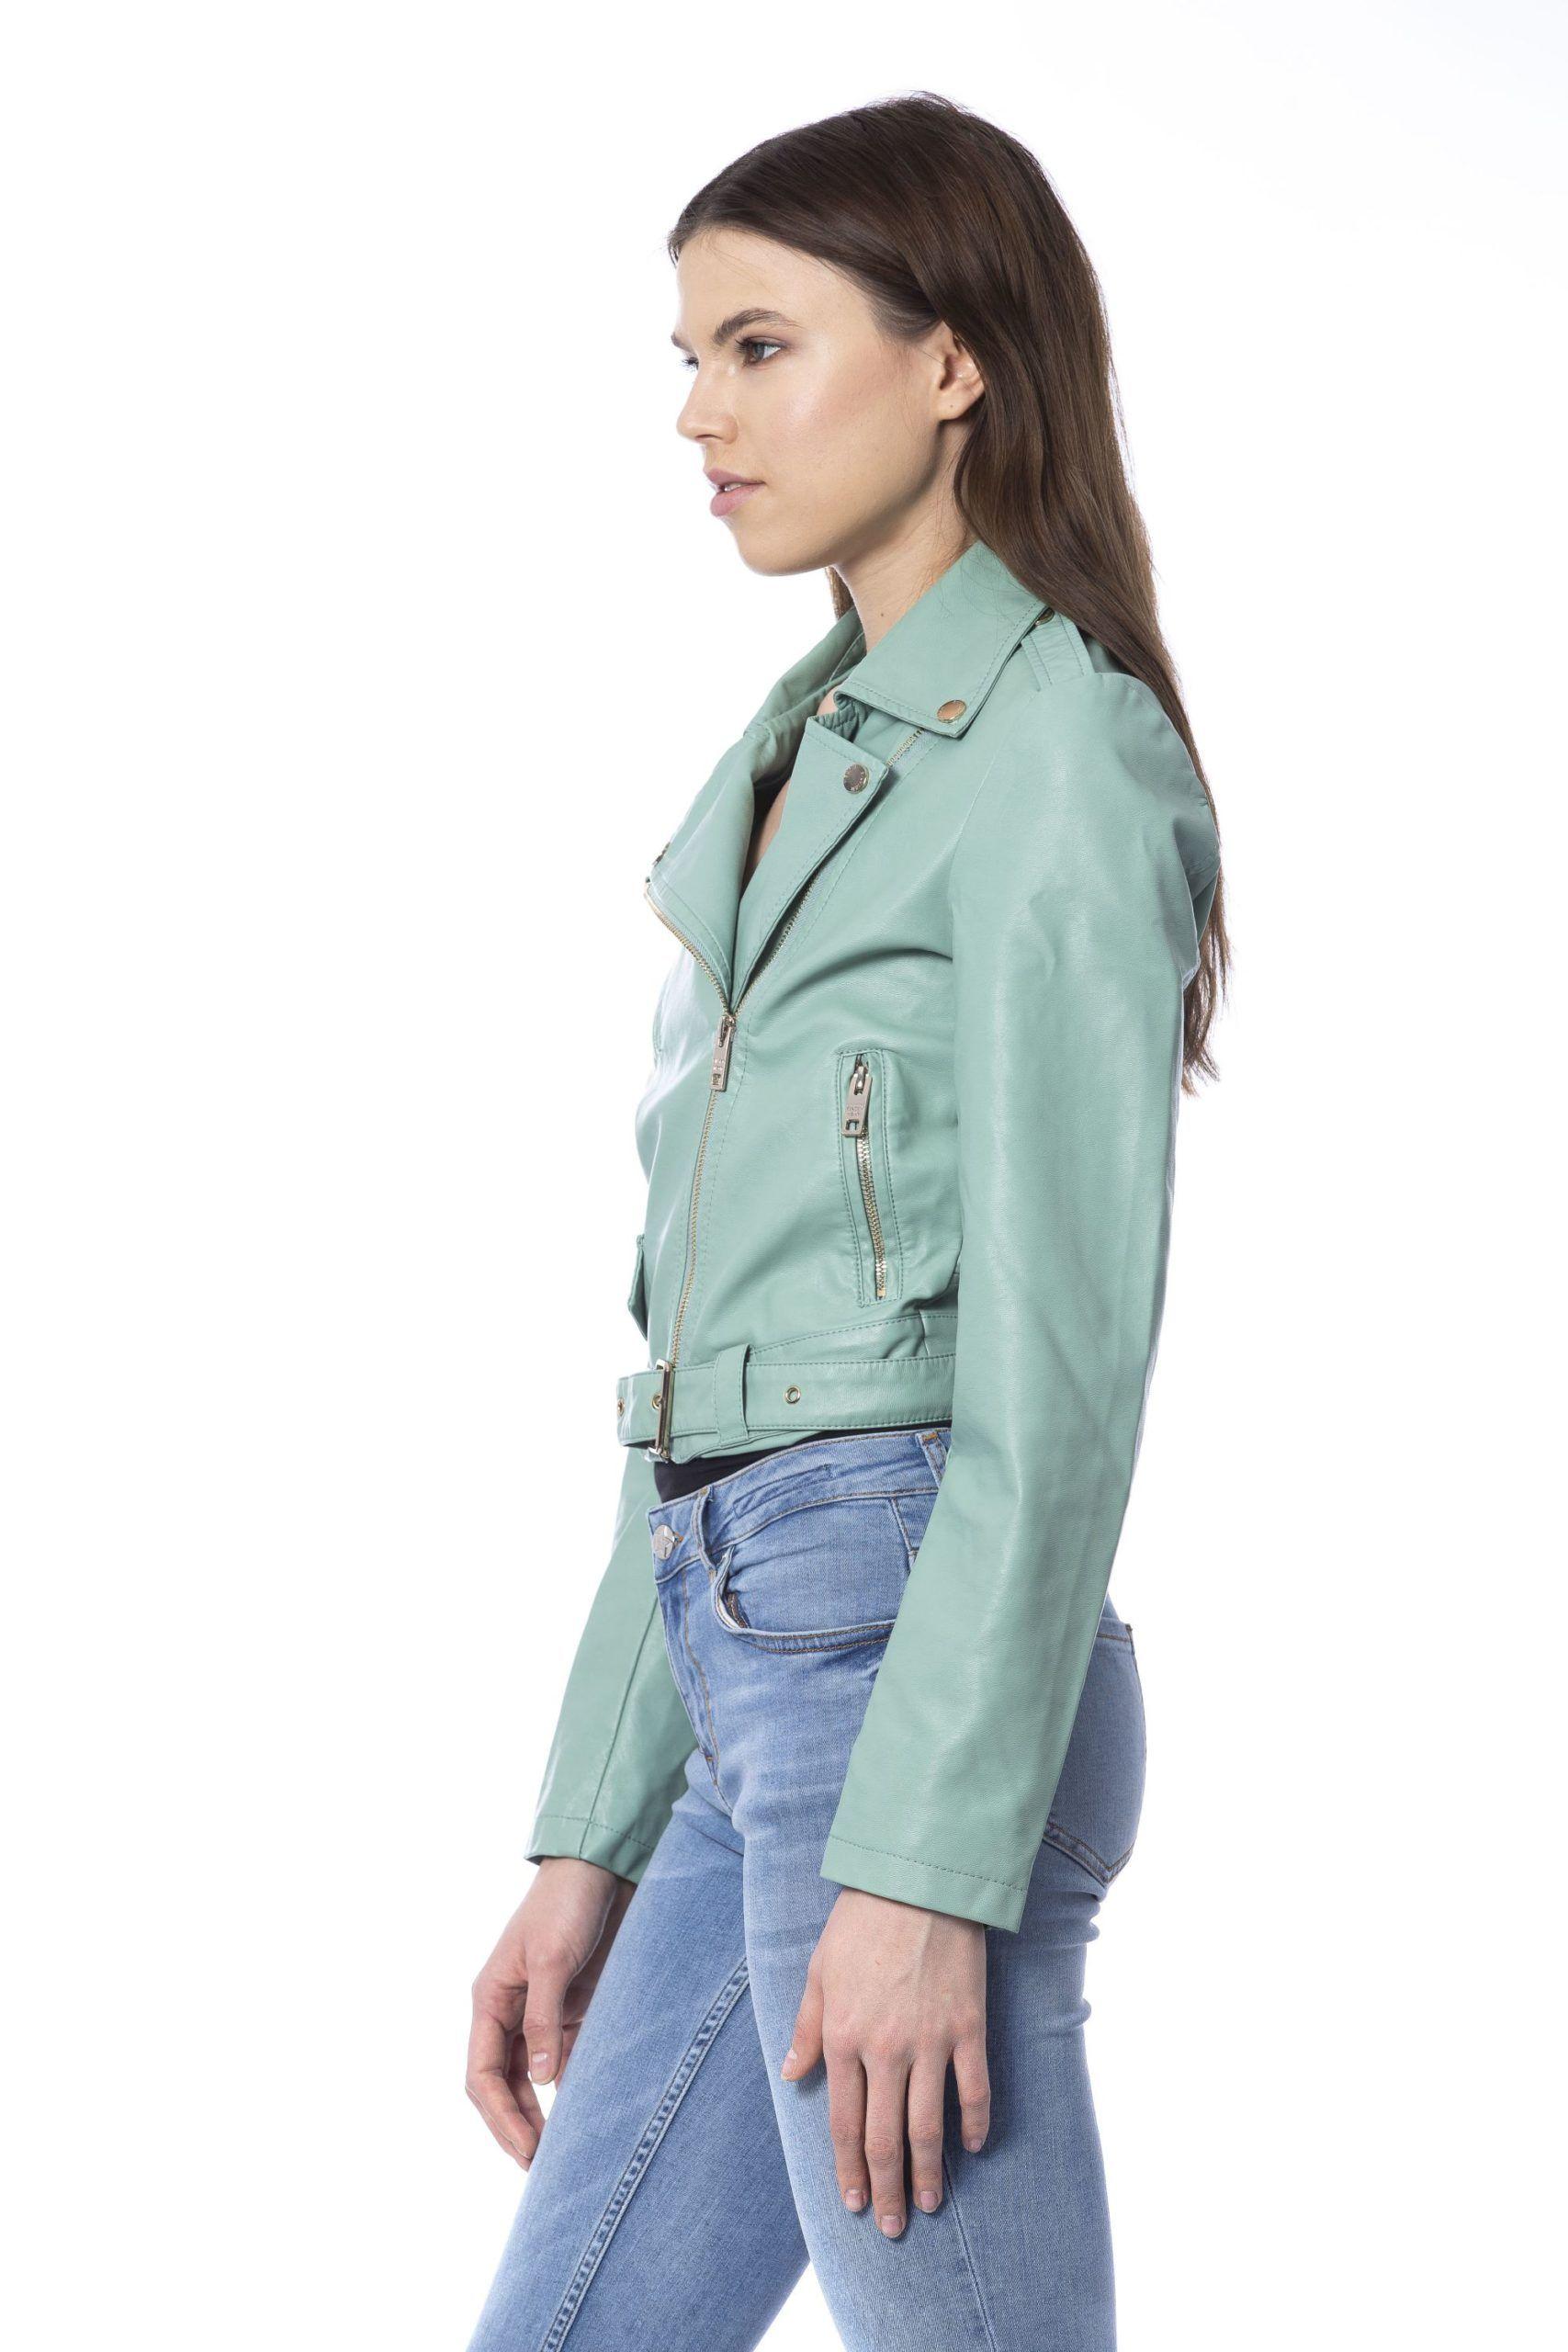 Silvian Heach Acquamarine Jackets & Coat